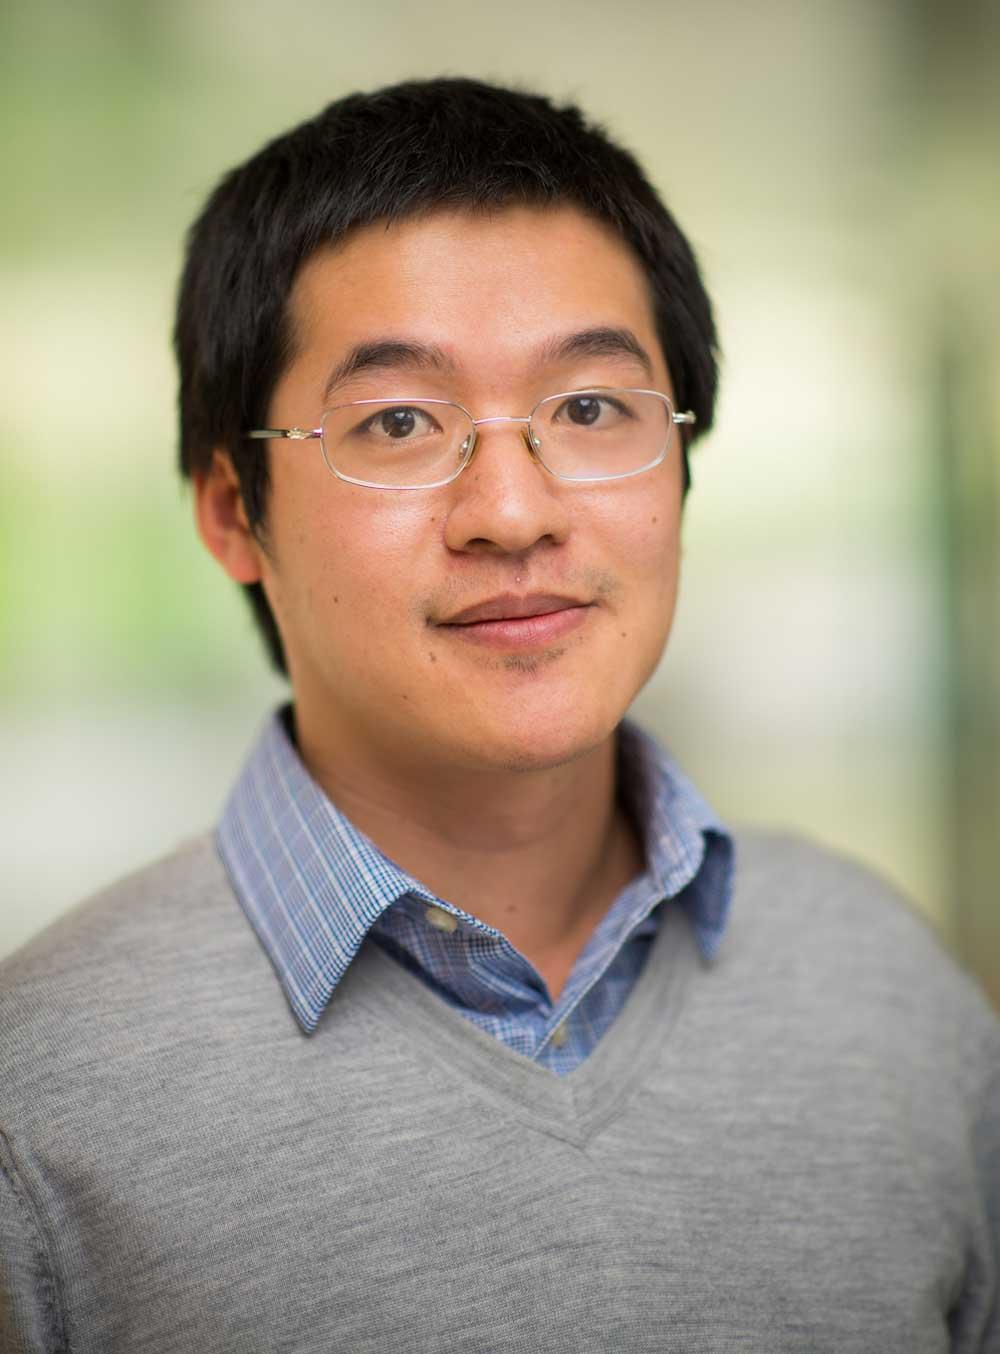 Dr. Yi-Hsuan Chen